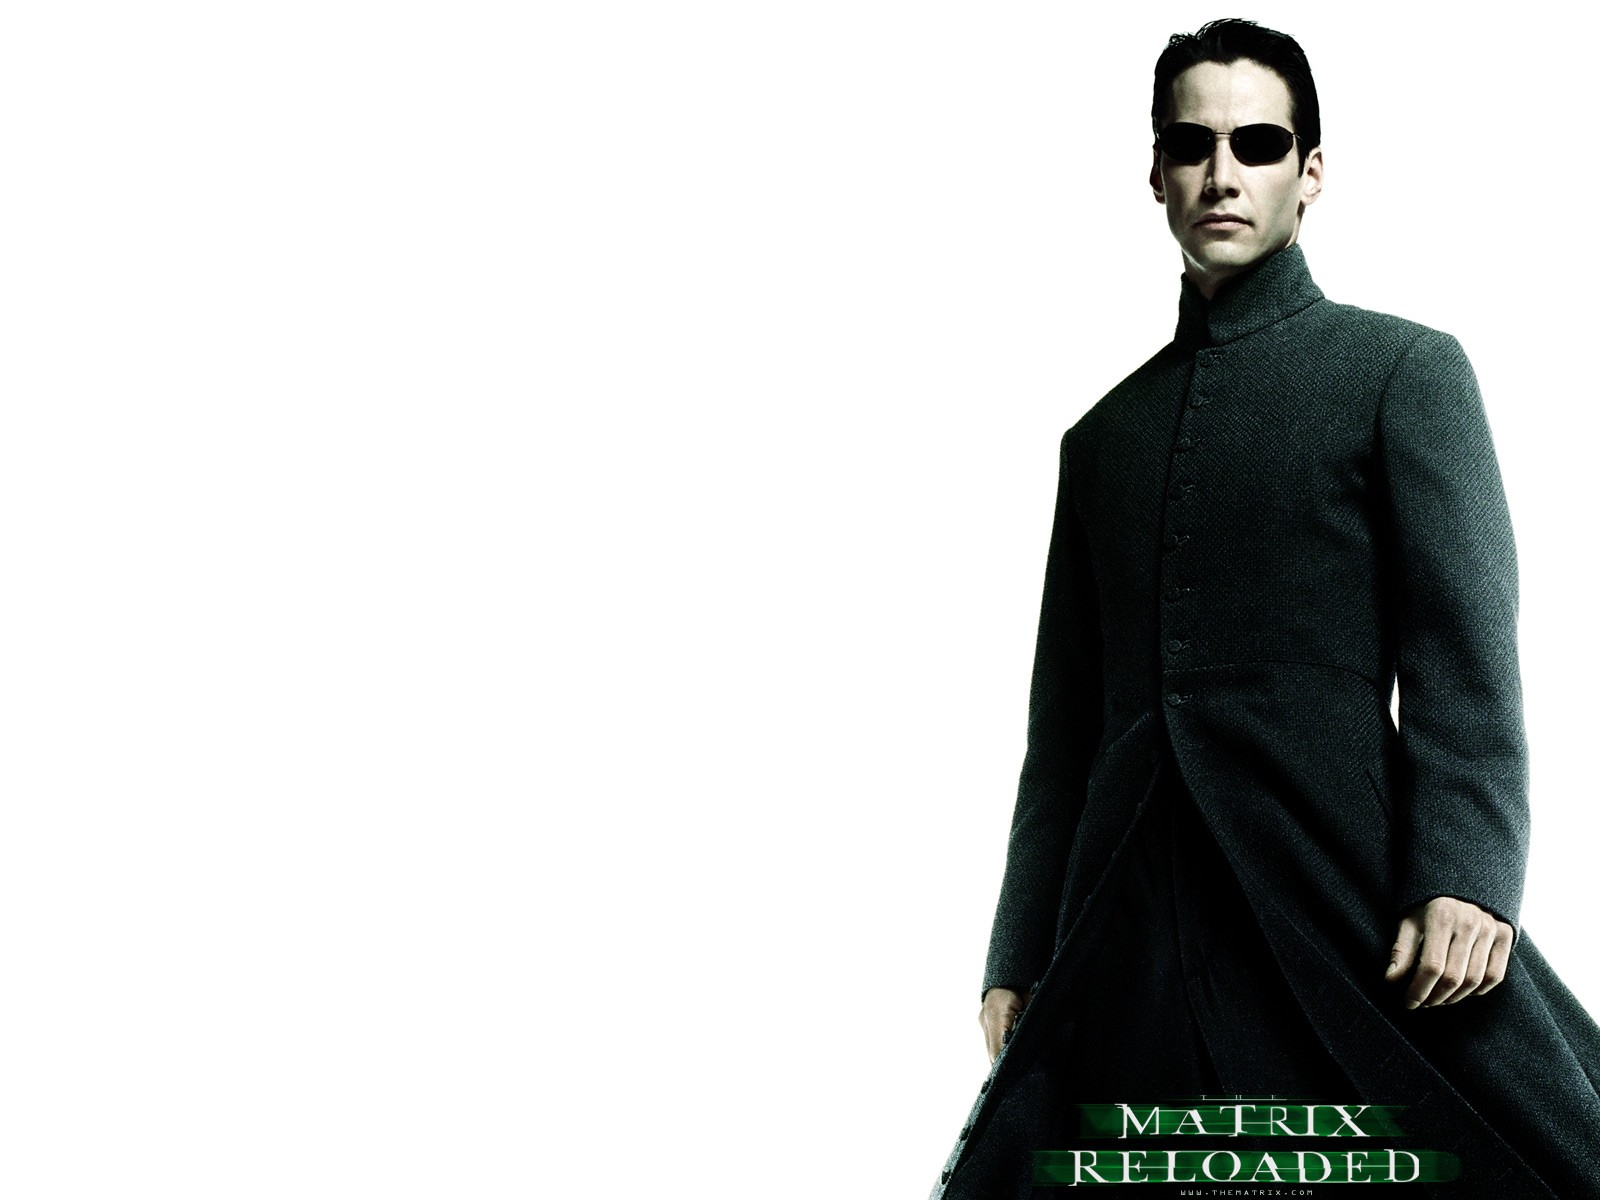 Wallpaper: Keanu Reeves è Neo nel film 'Matrix Reloaded'